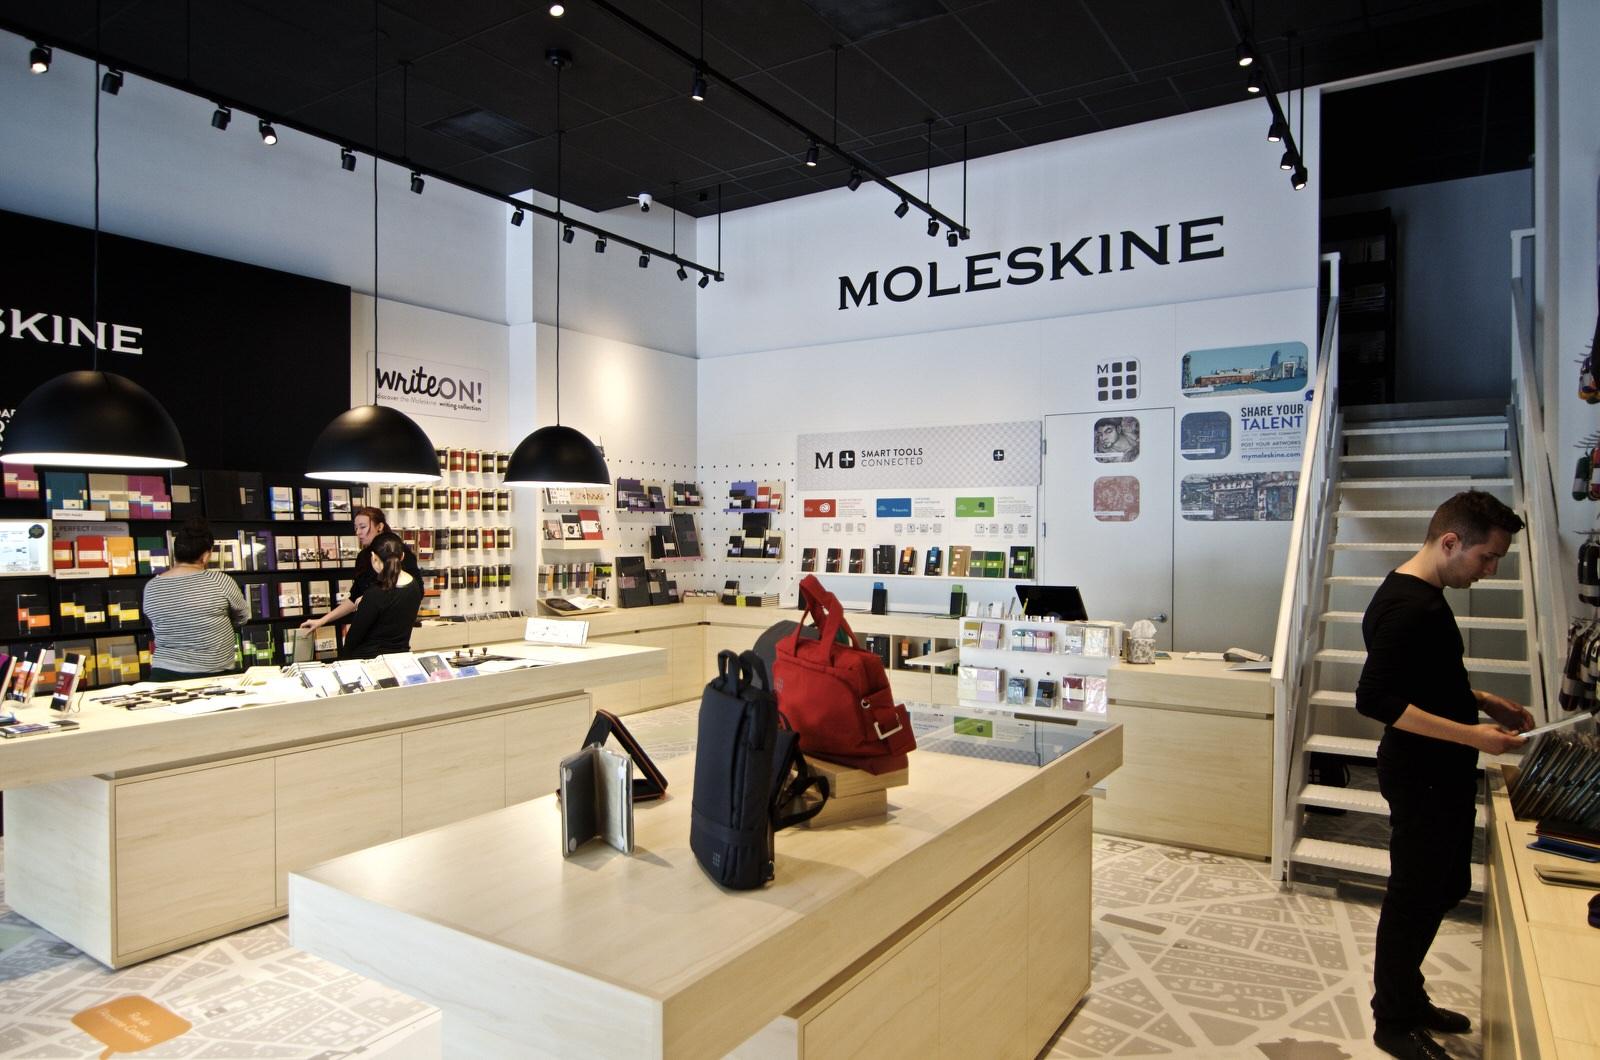 Moleskine1